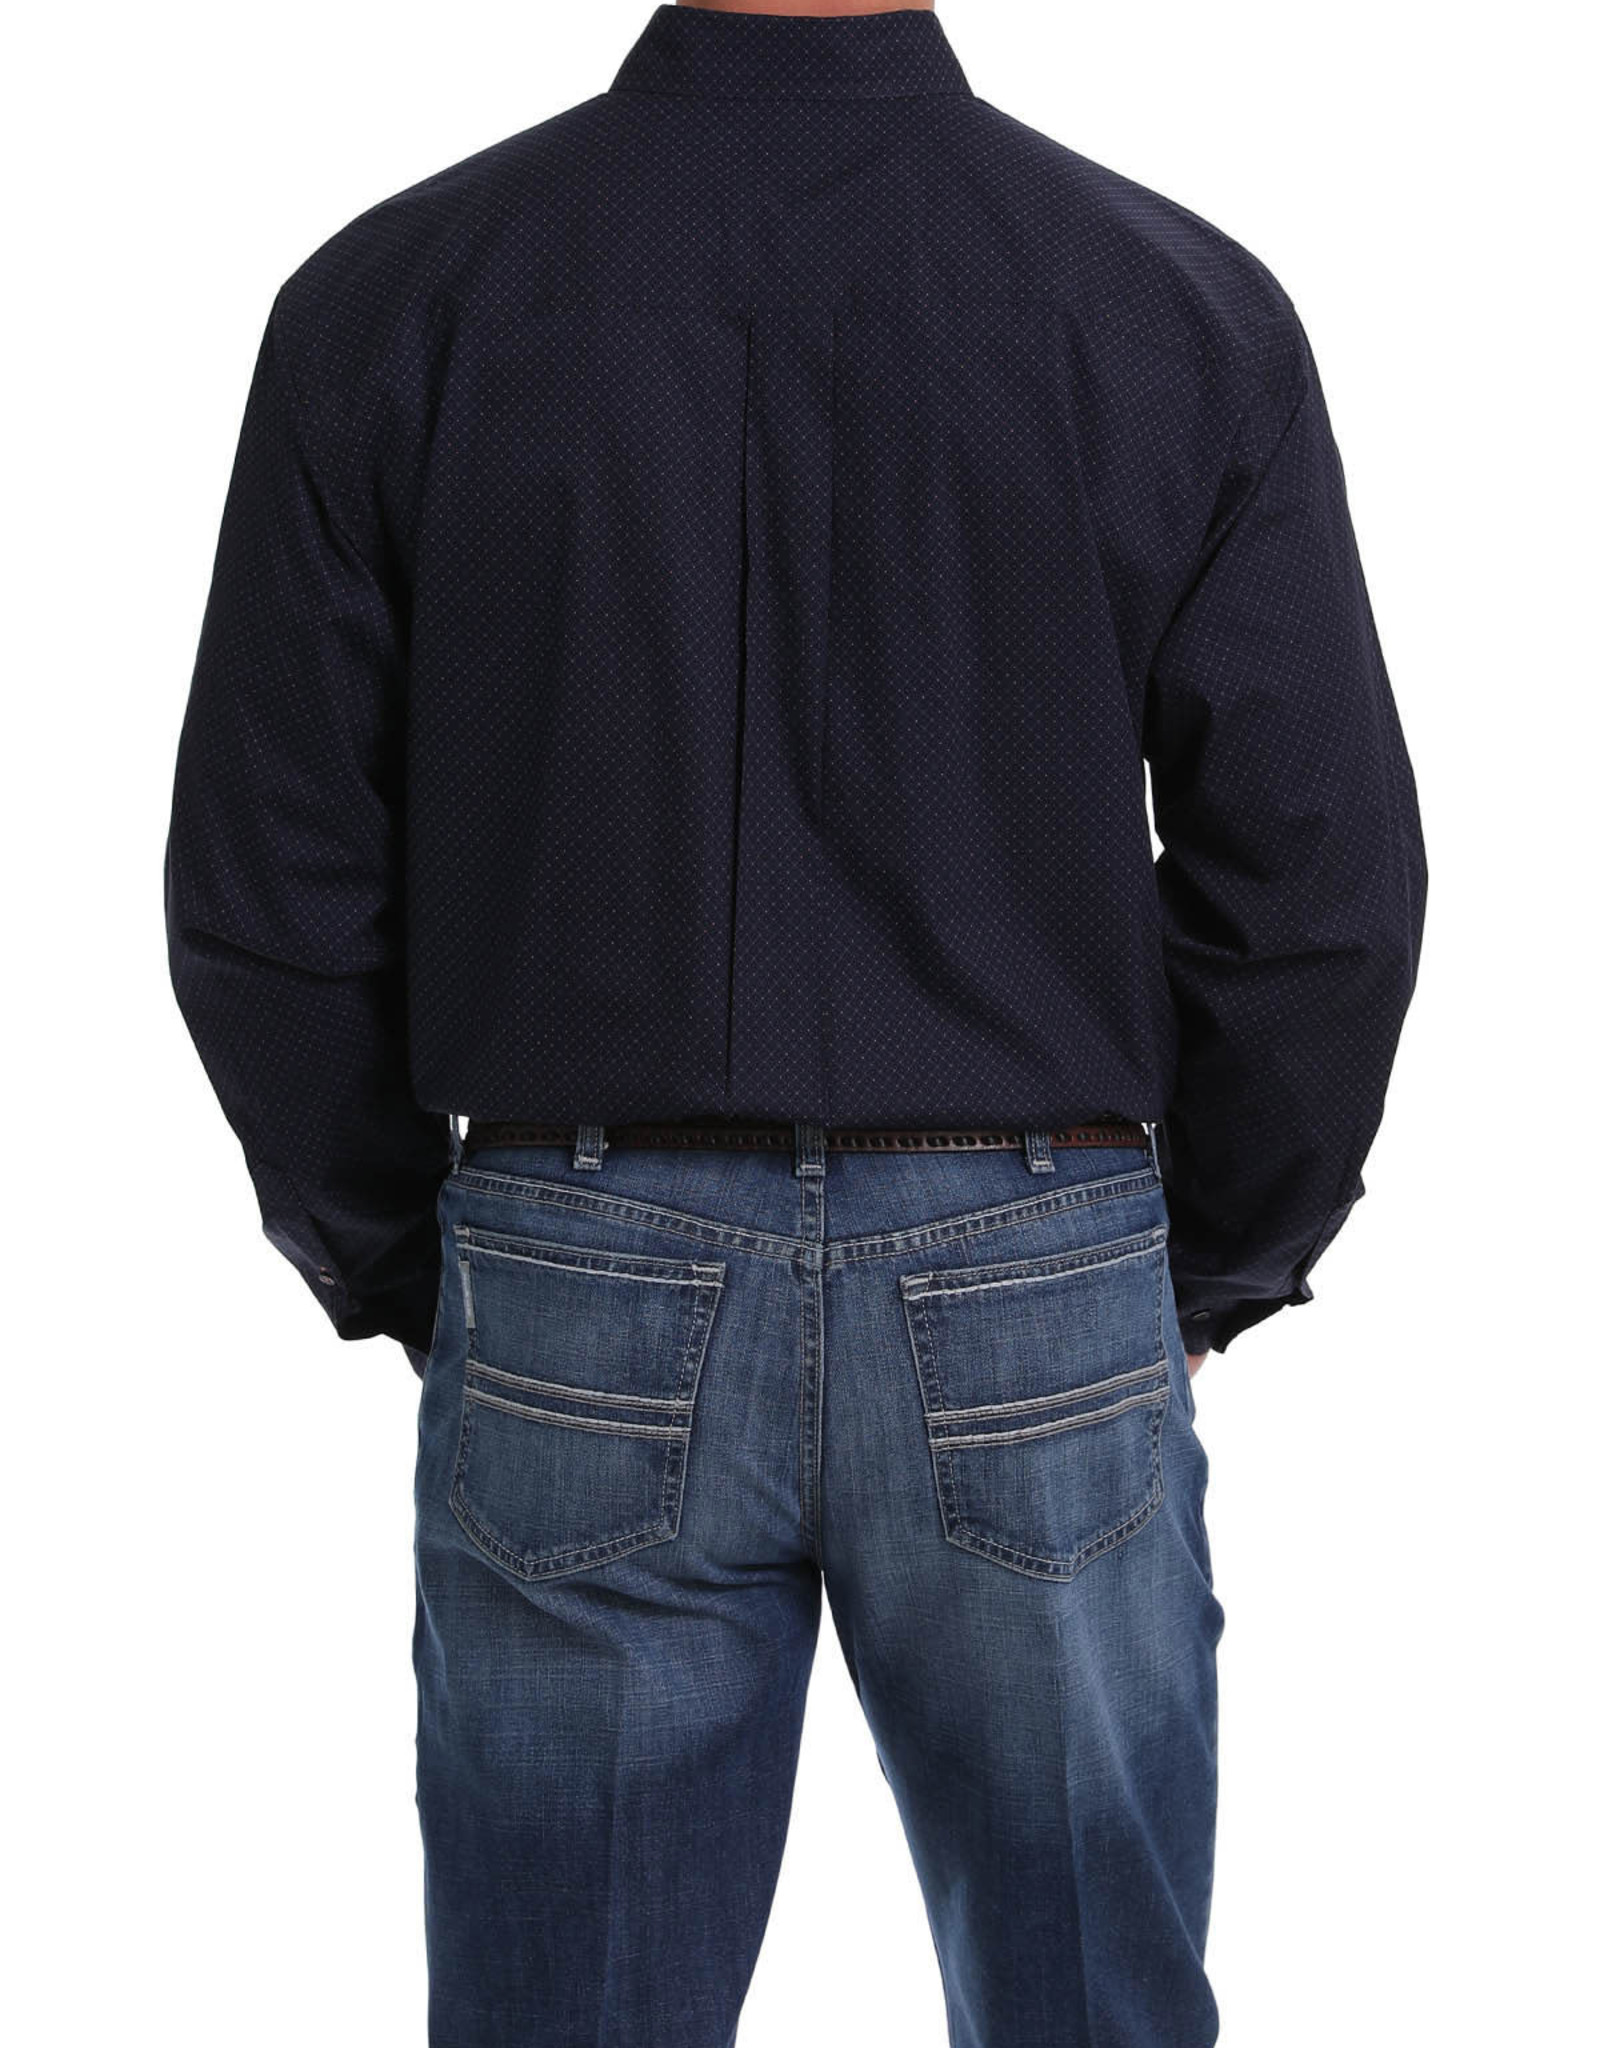 Cinch MENS CINCH NAVY, BLACK, ORANGE PRINT BUTTON-DOWN SHIRT